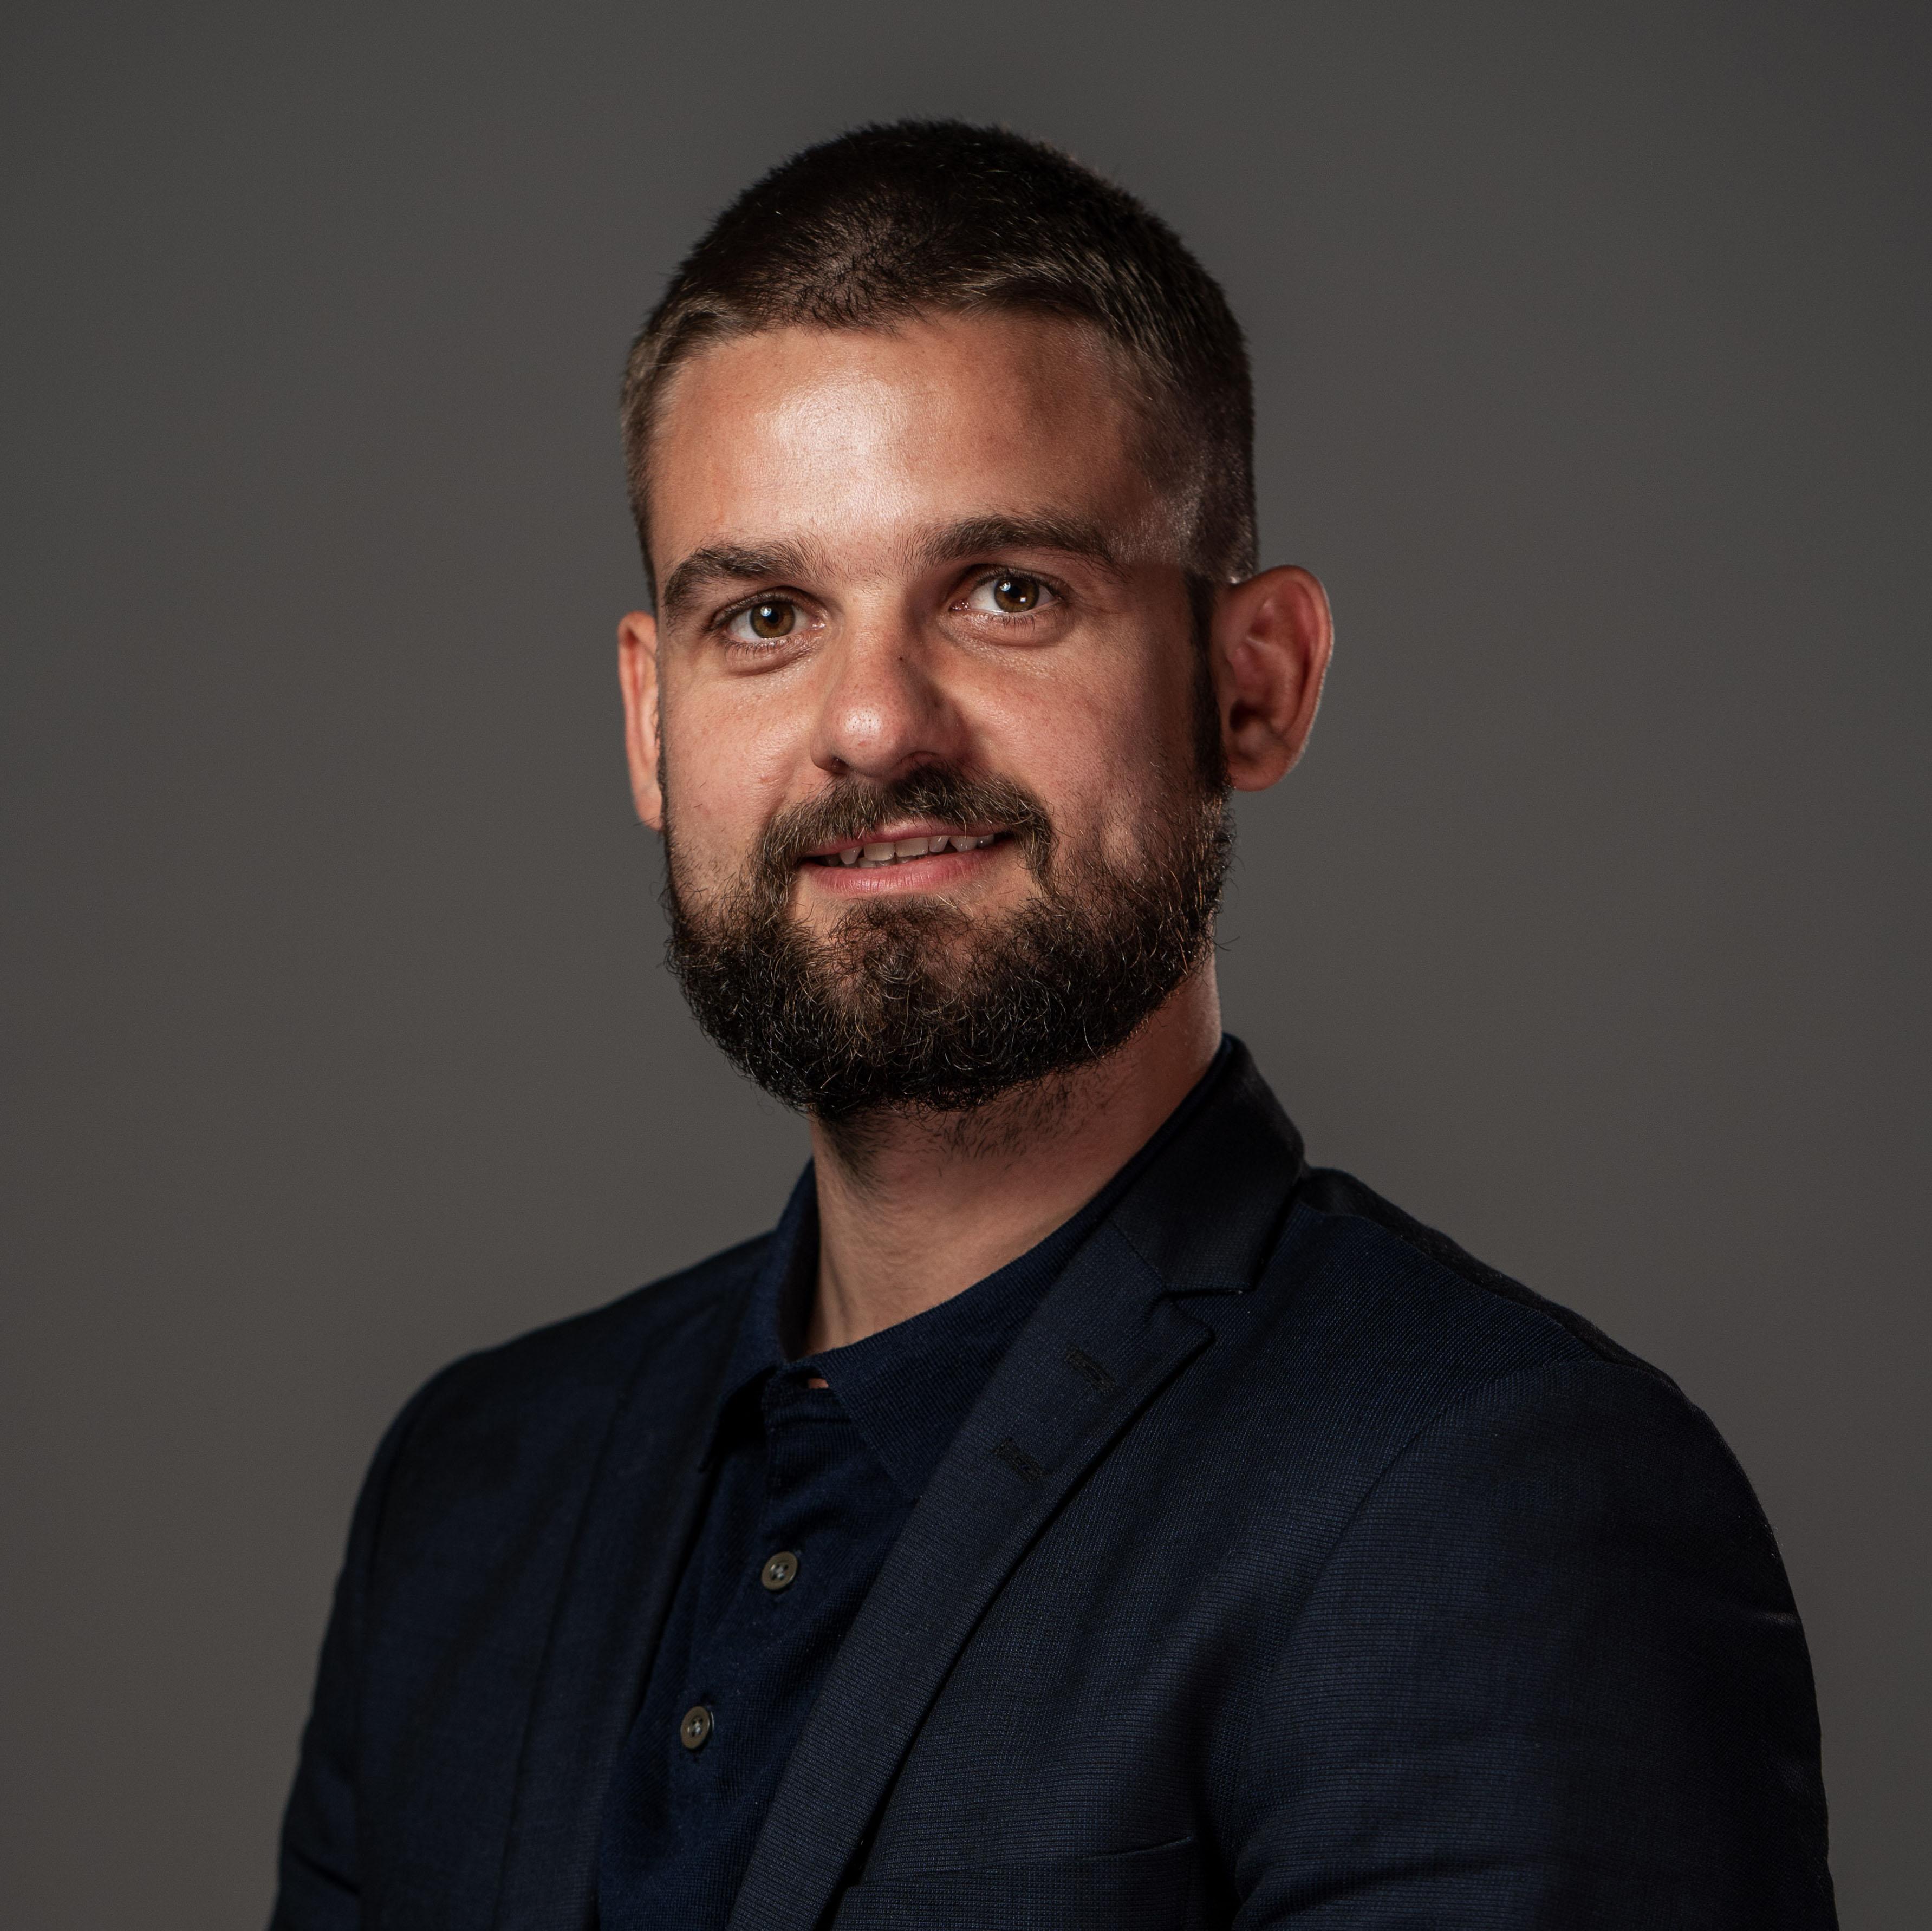 Martin Mariussen Nyvang